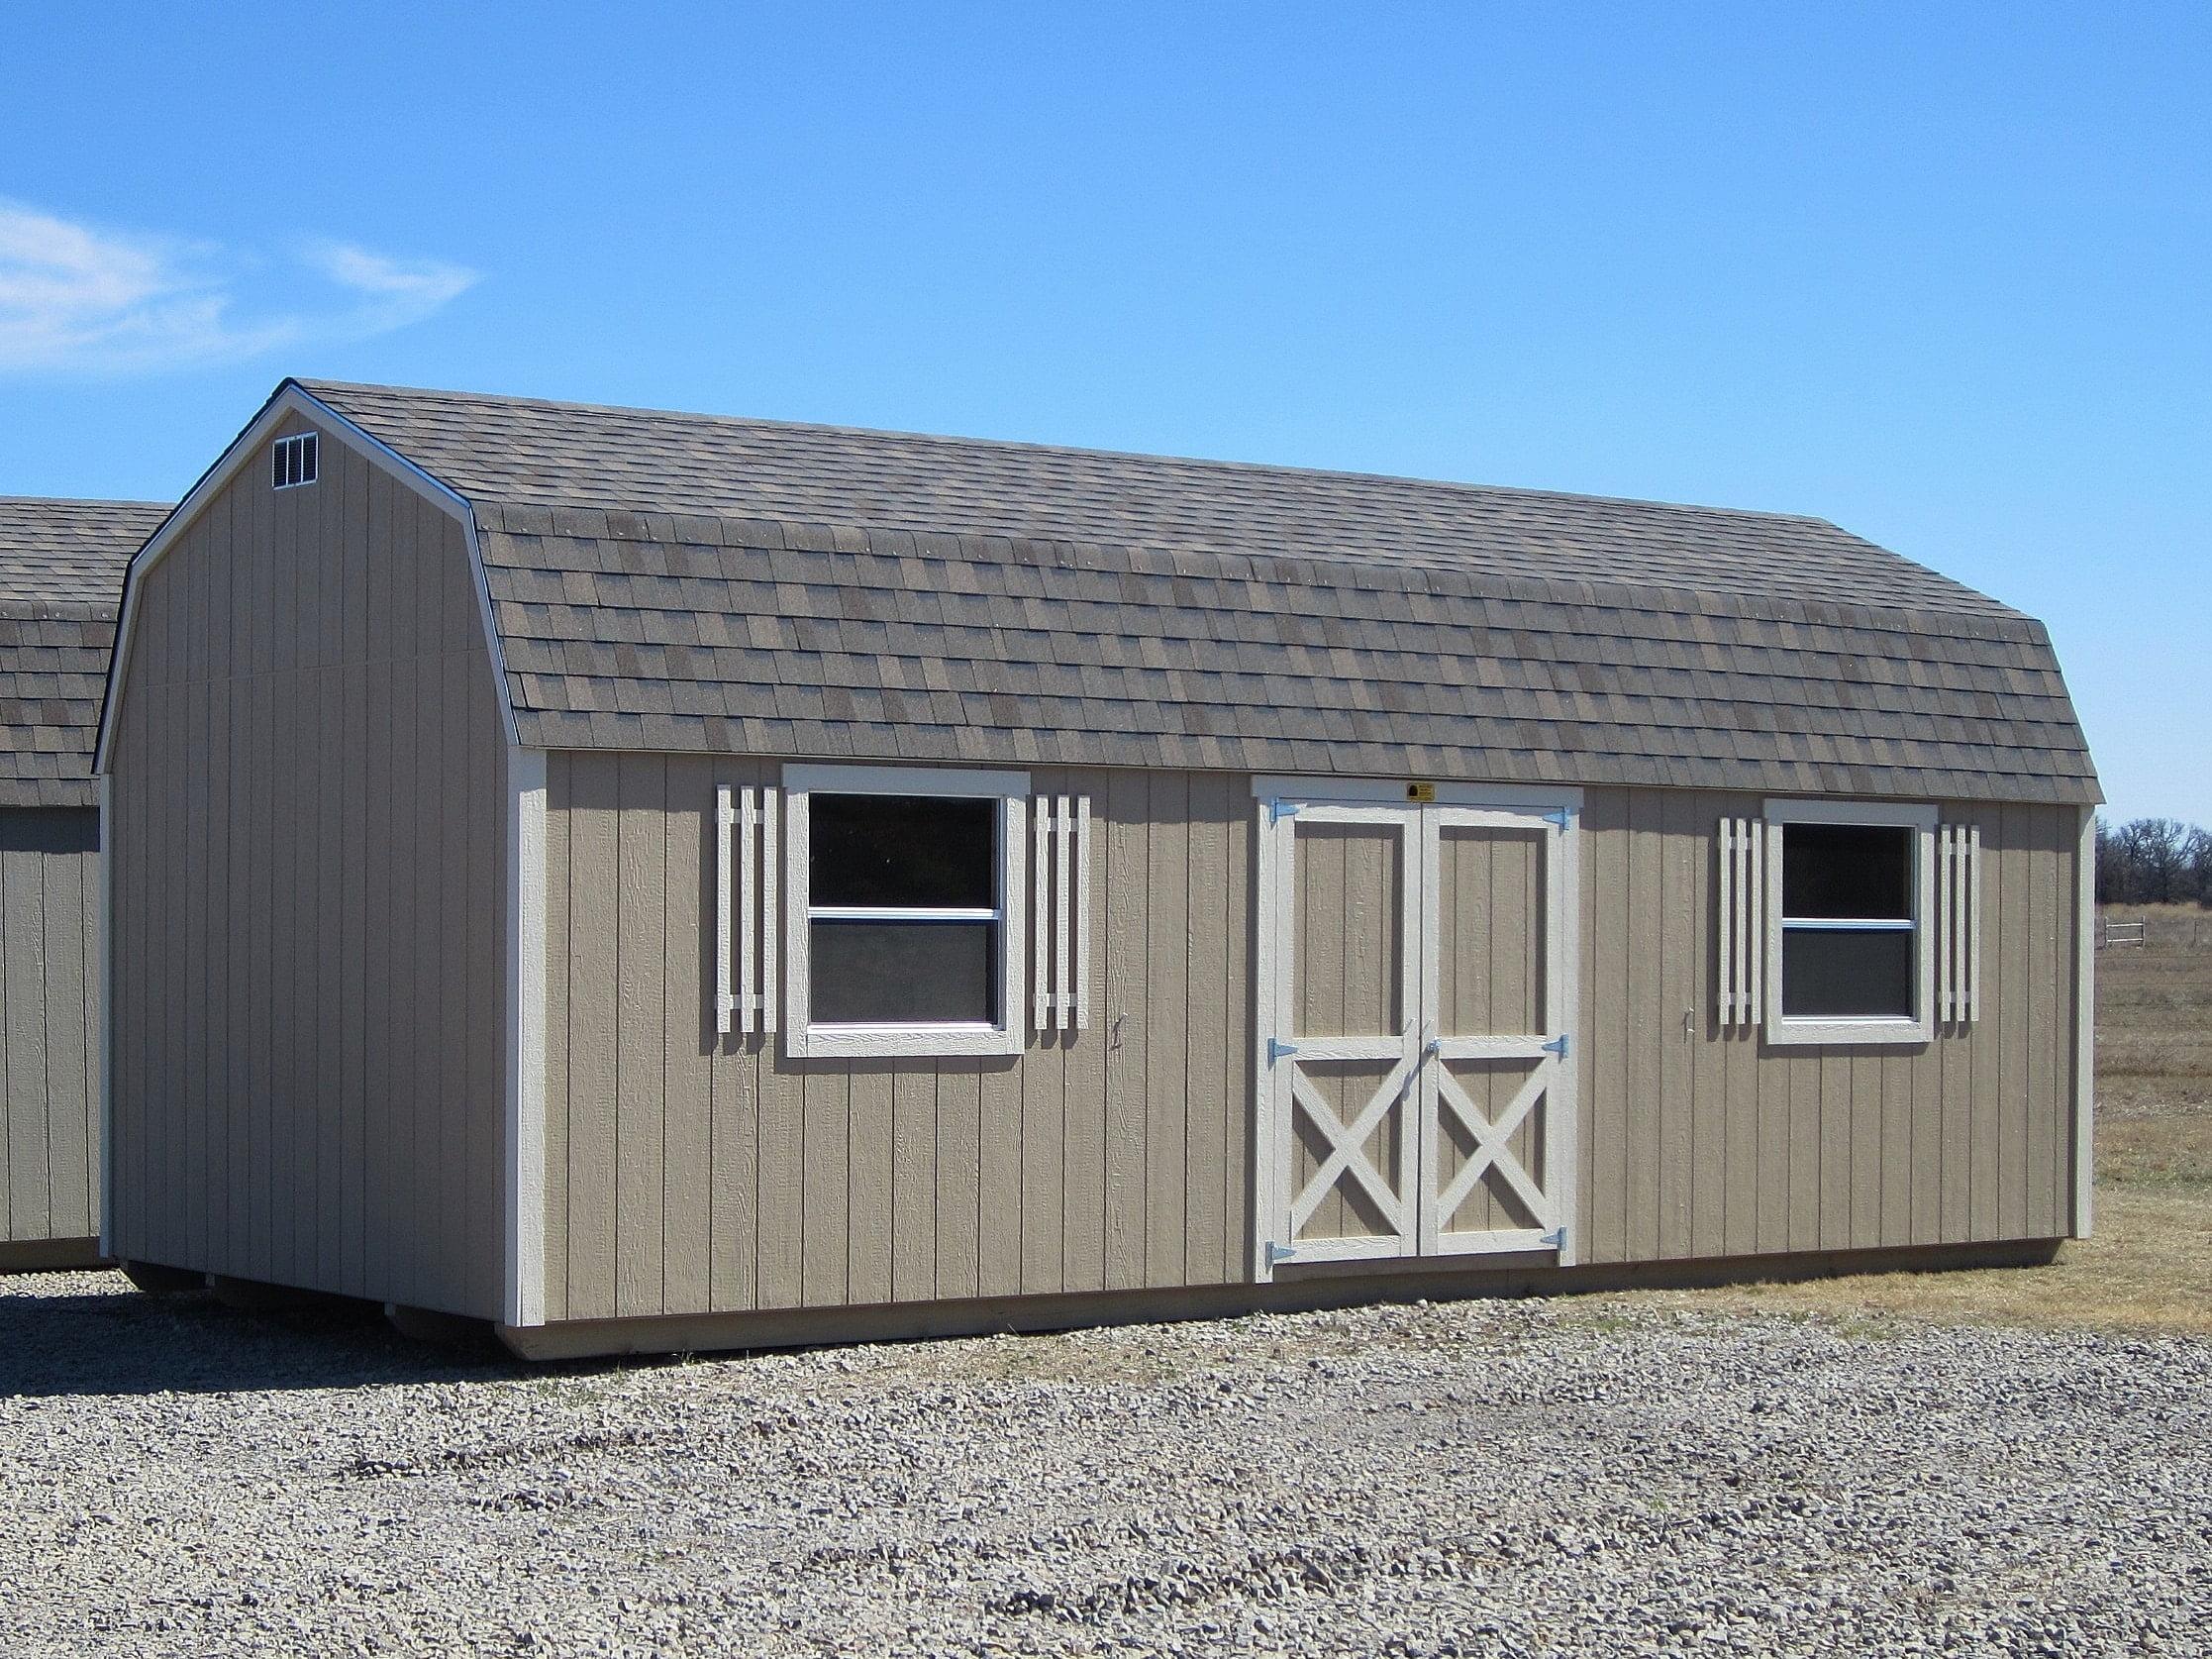 Loft Barns - Better Built Barns